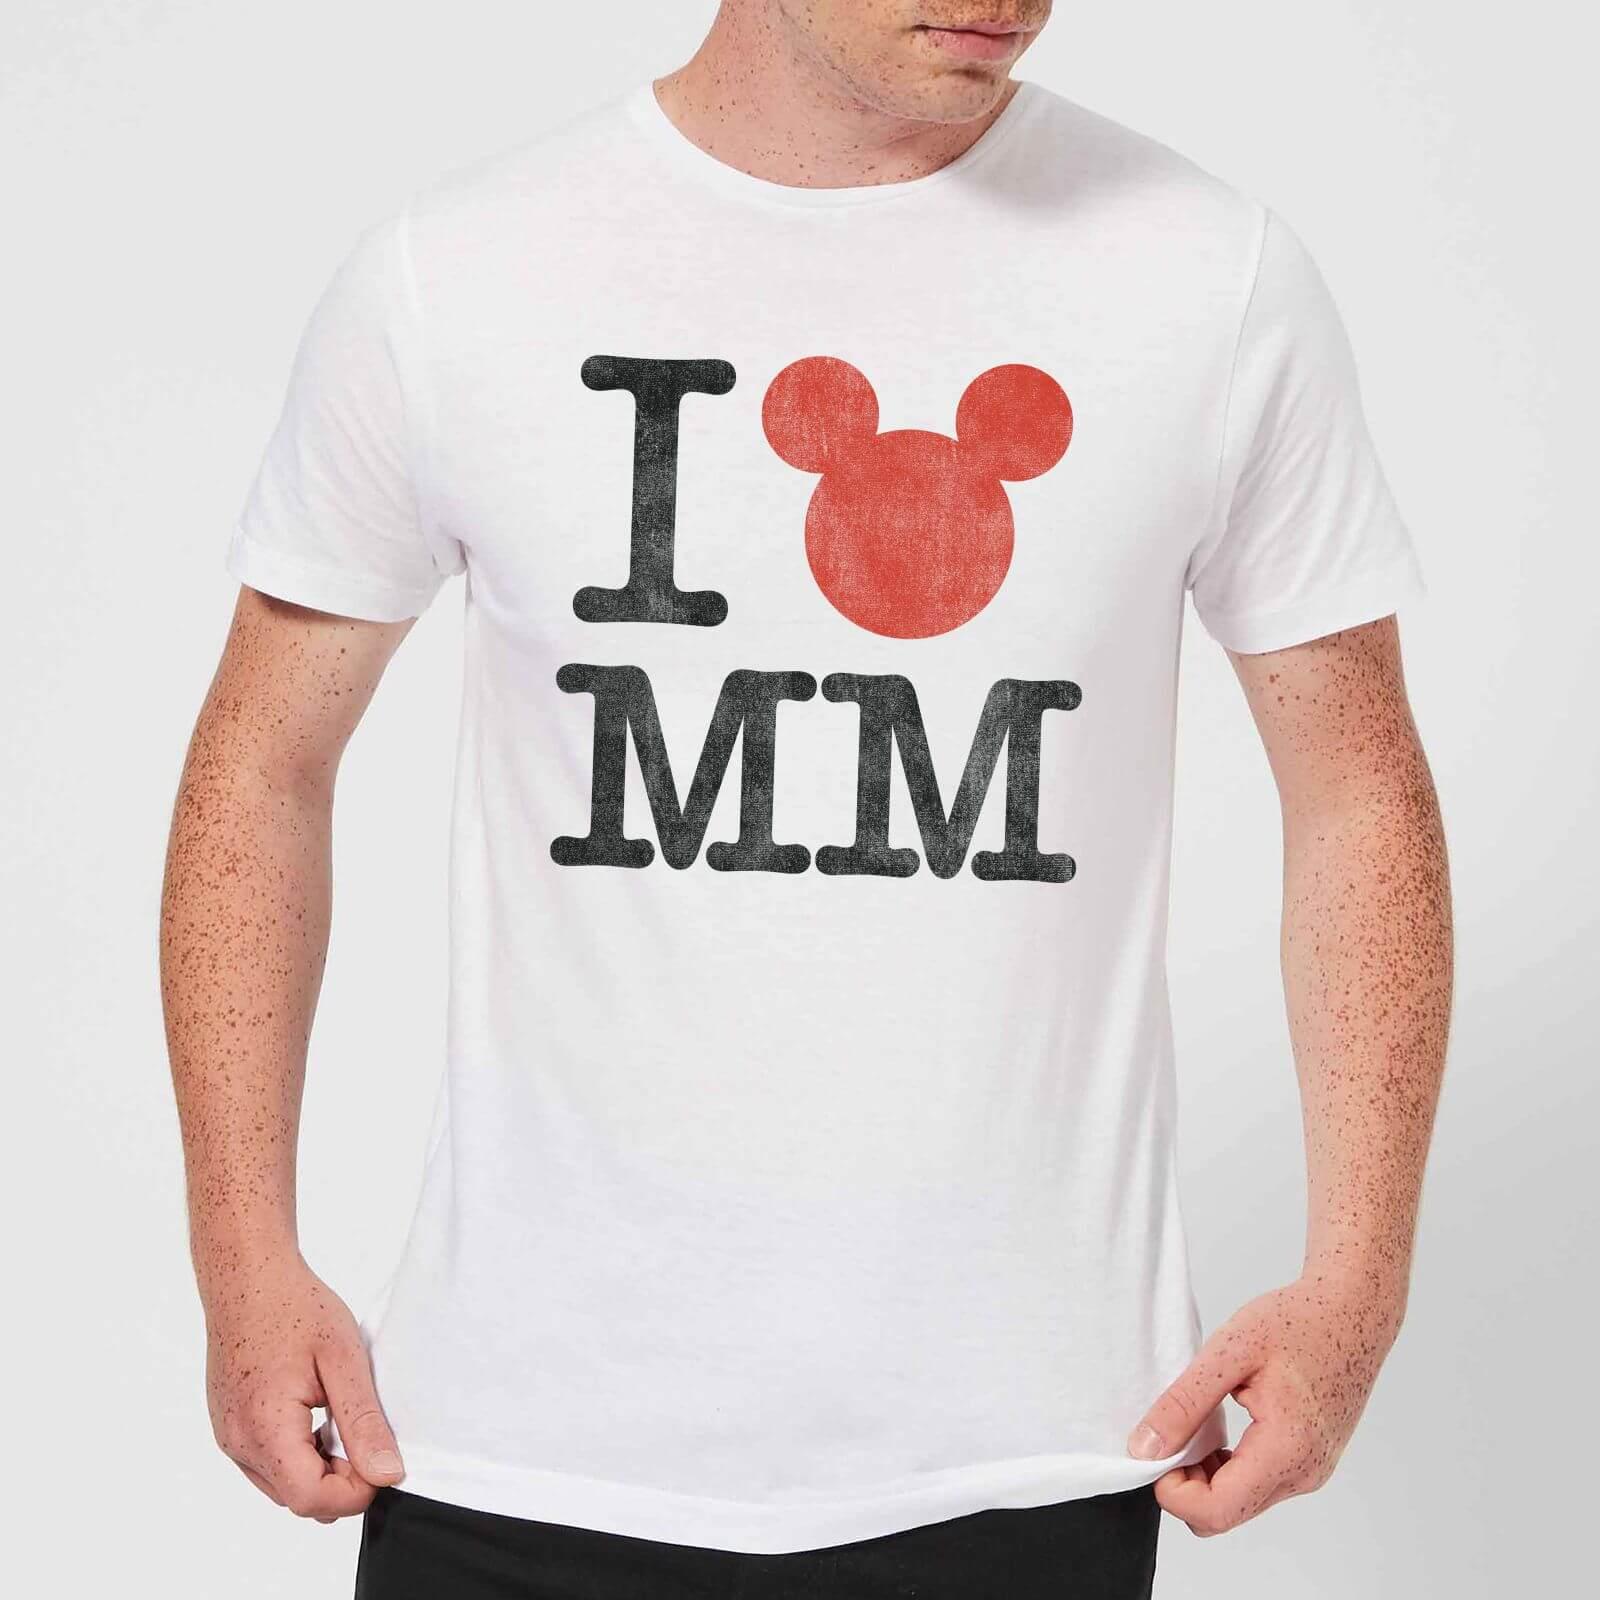 Disney Disney Mickey Mouse I Heart MM T-Shirt - White - 4XL - White